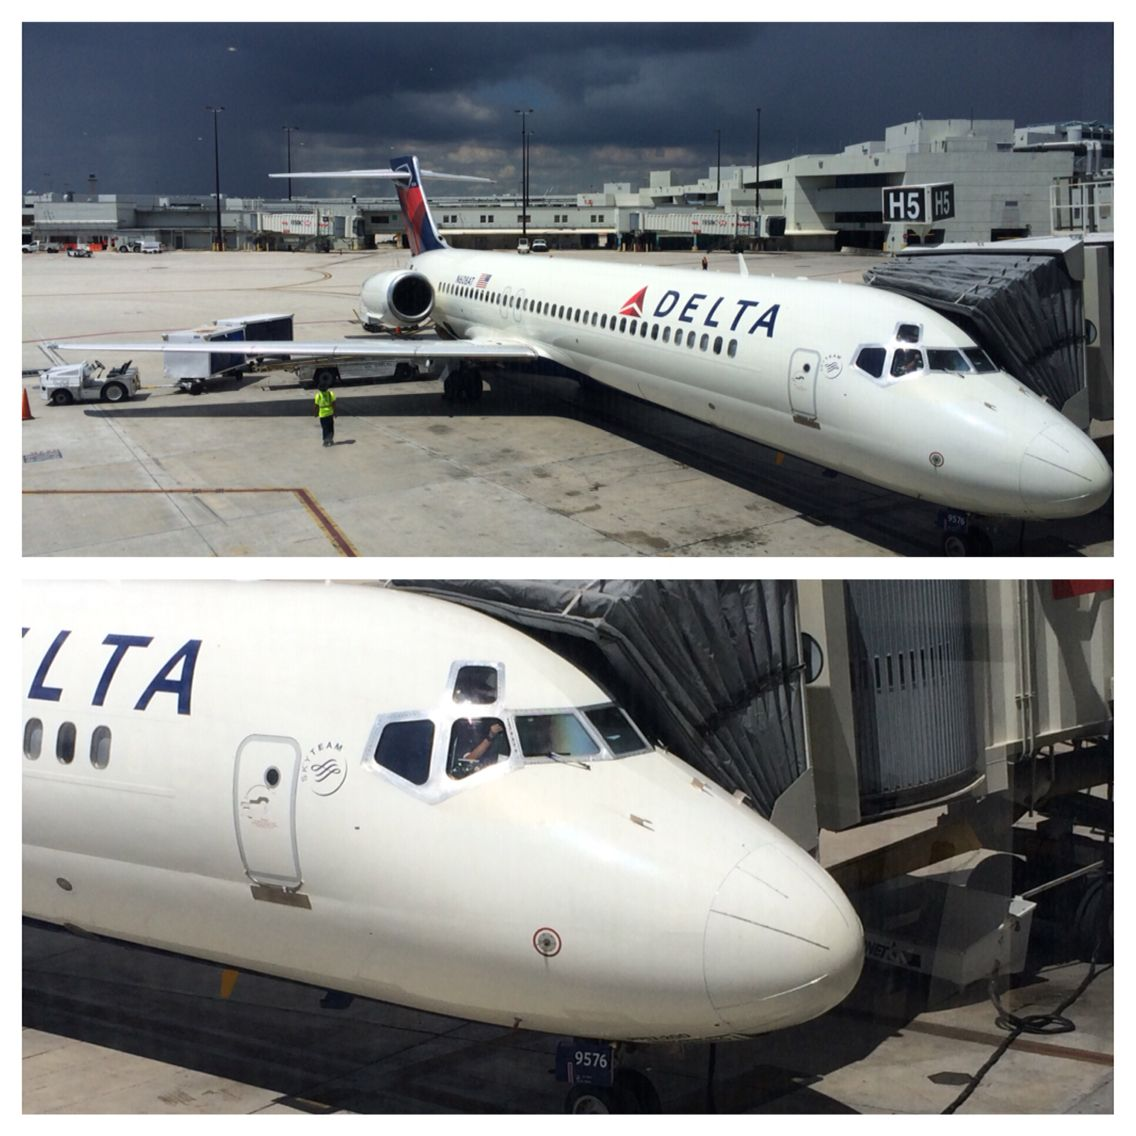 Miami delta flights lga to